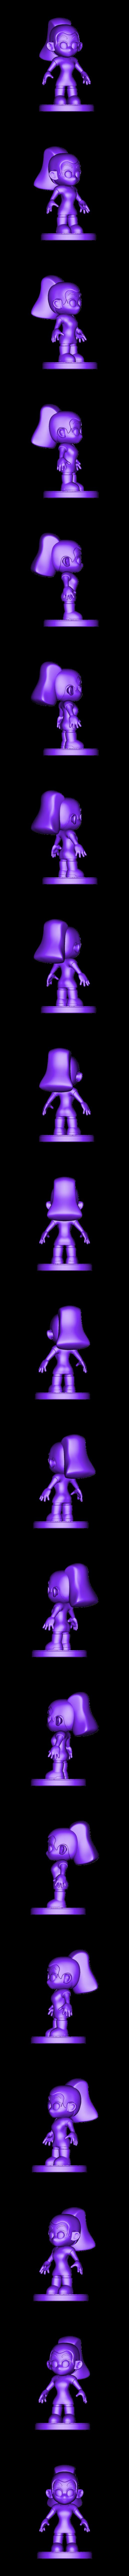 arianagrandestli.stl Descargar archivo STL Ariana Grande chibi • Objeto para impresión 3D, MatteoMoscatelli